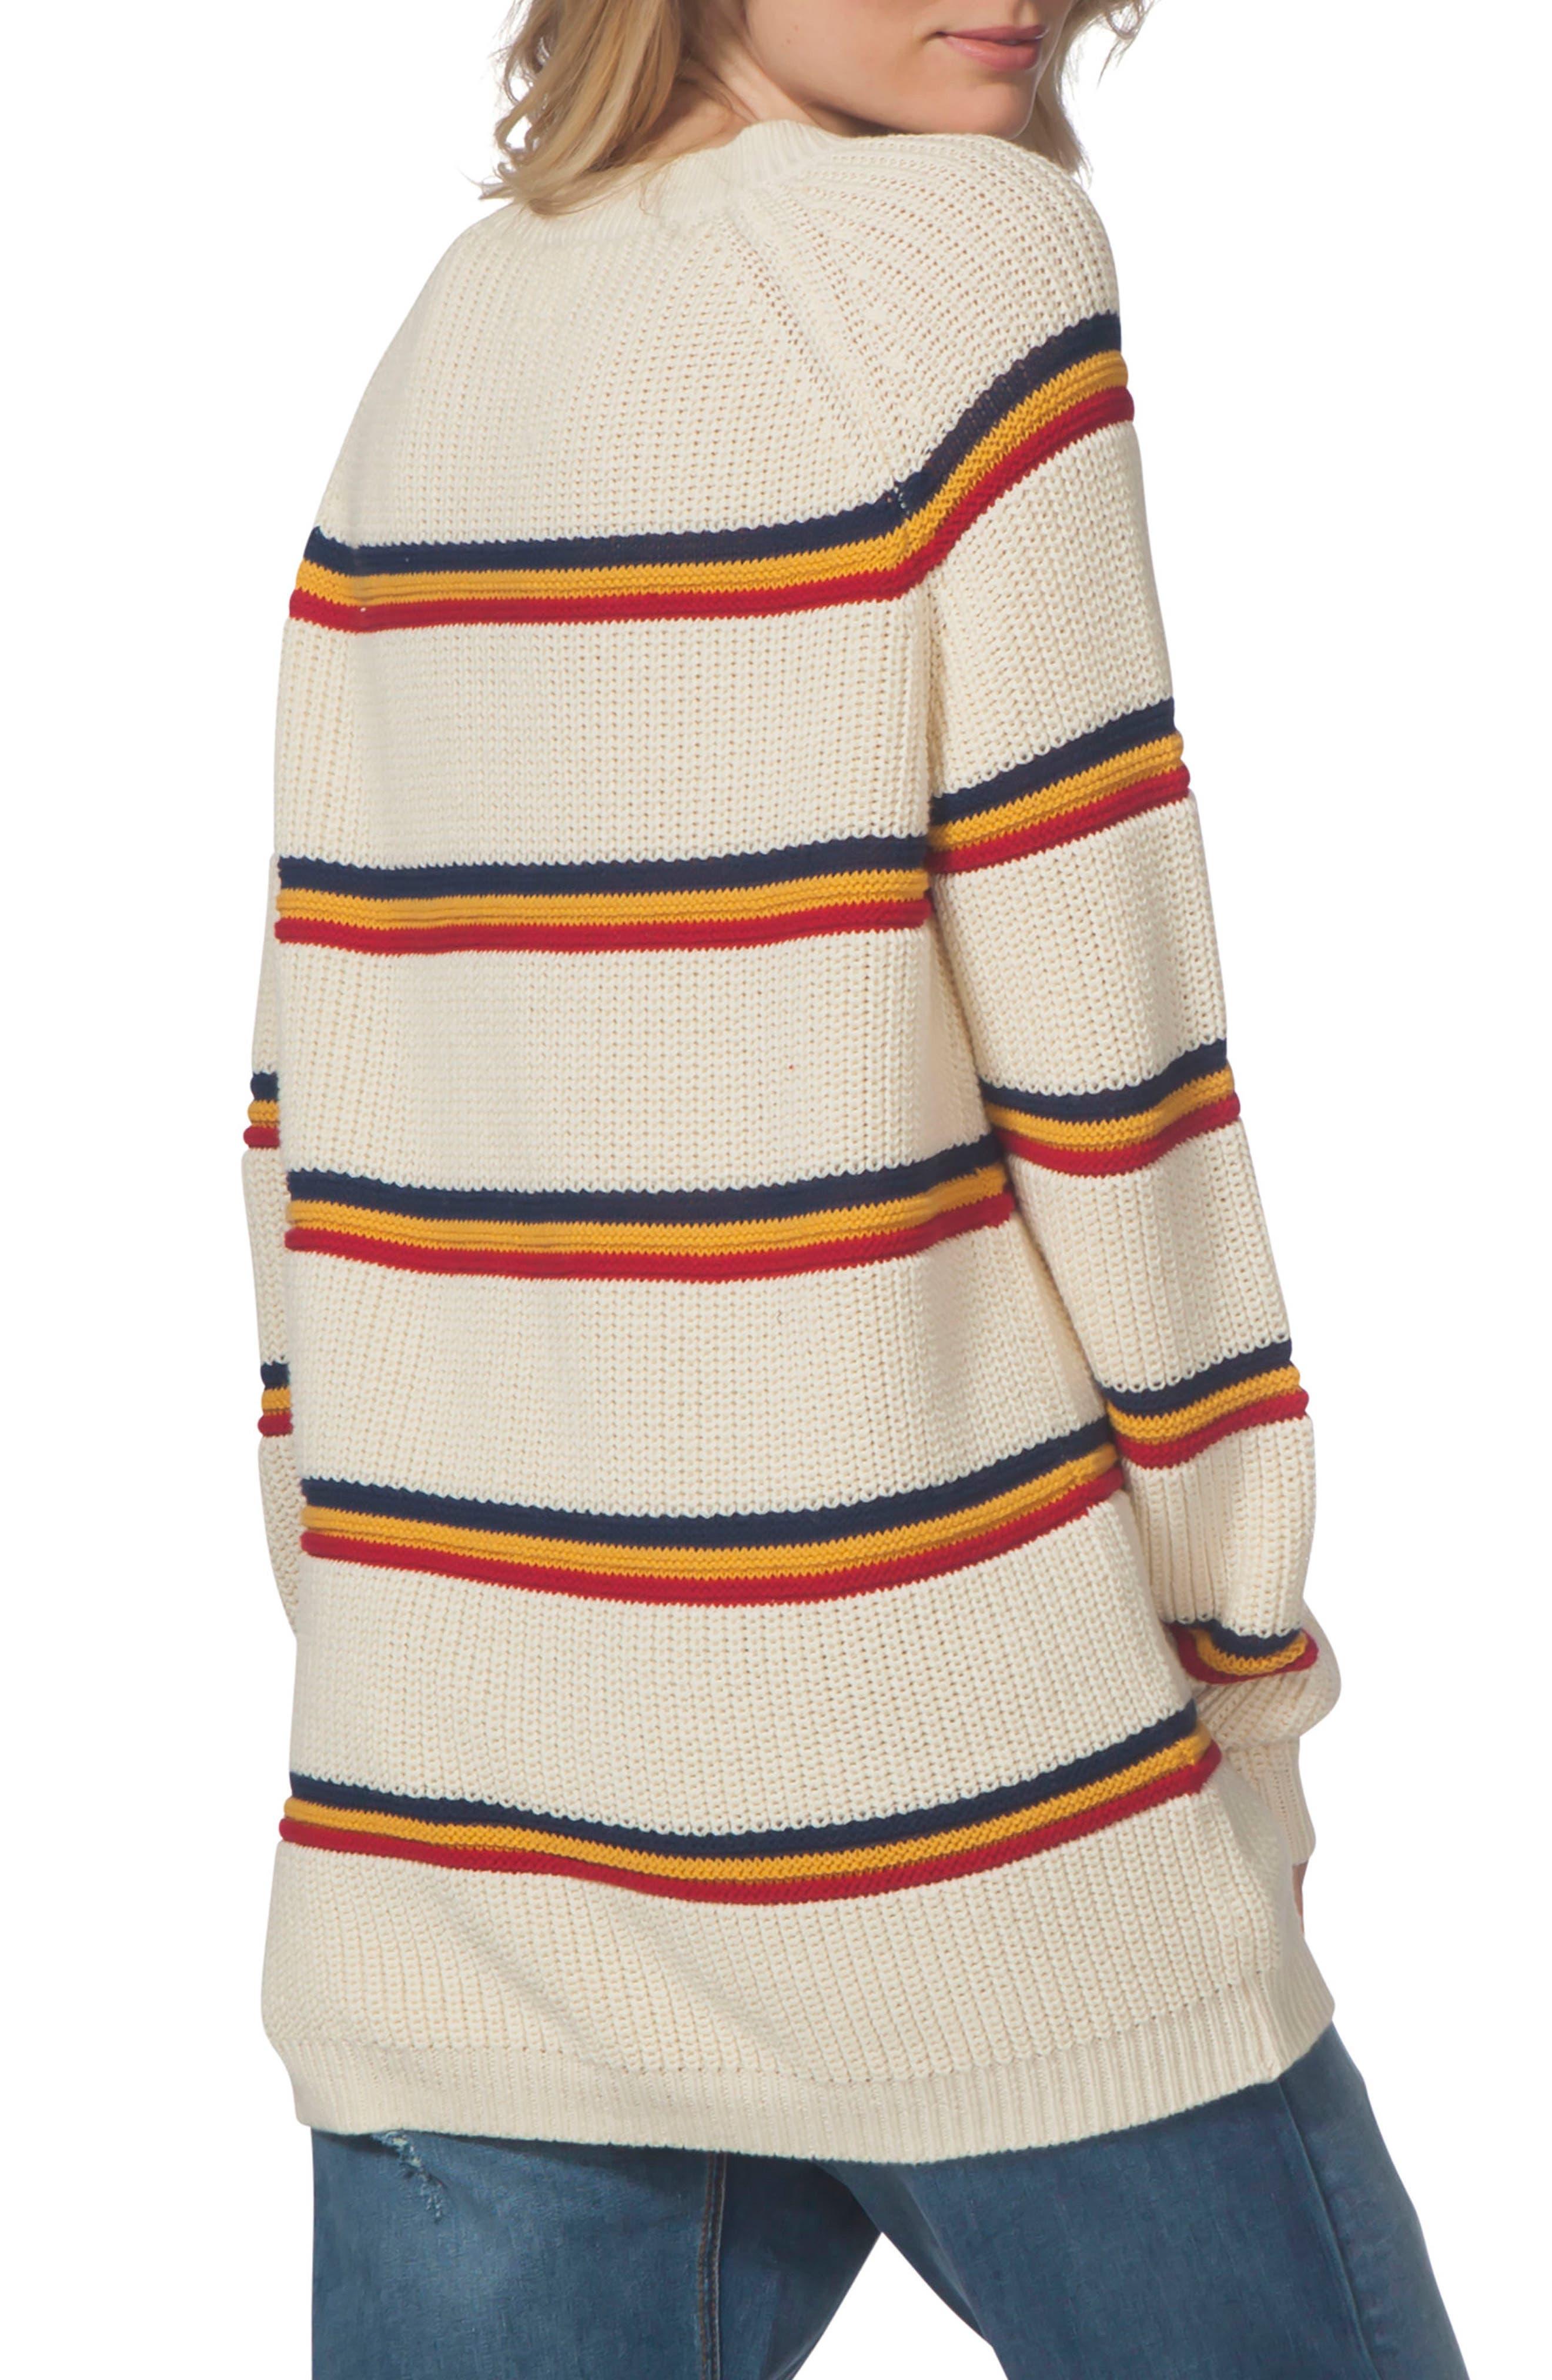 Raine Stripe Sweater,                             Alternate thumbnail 2, color,                             111